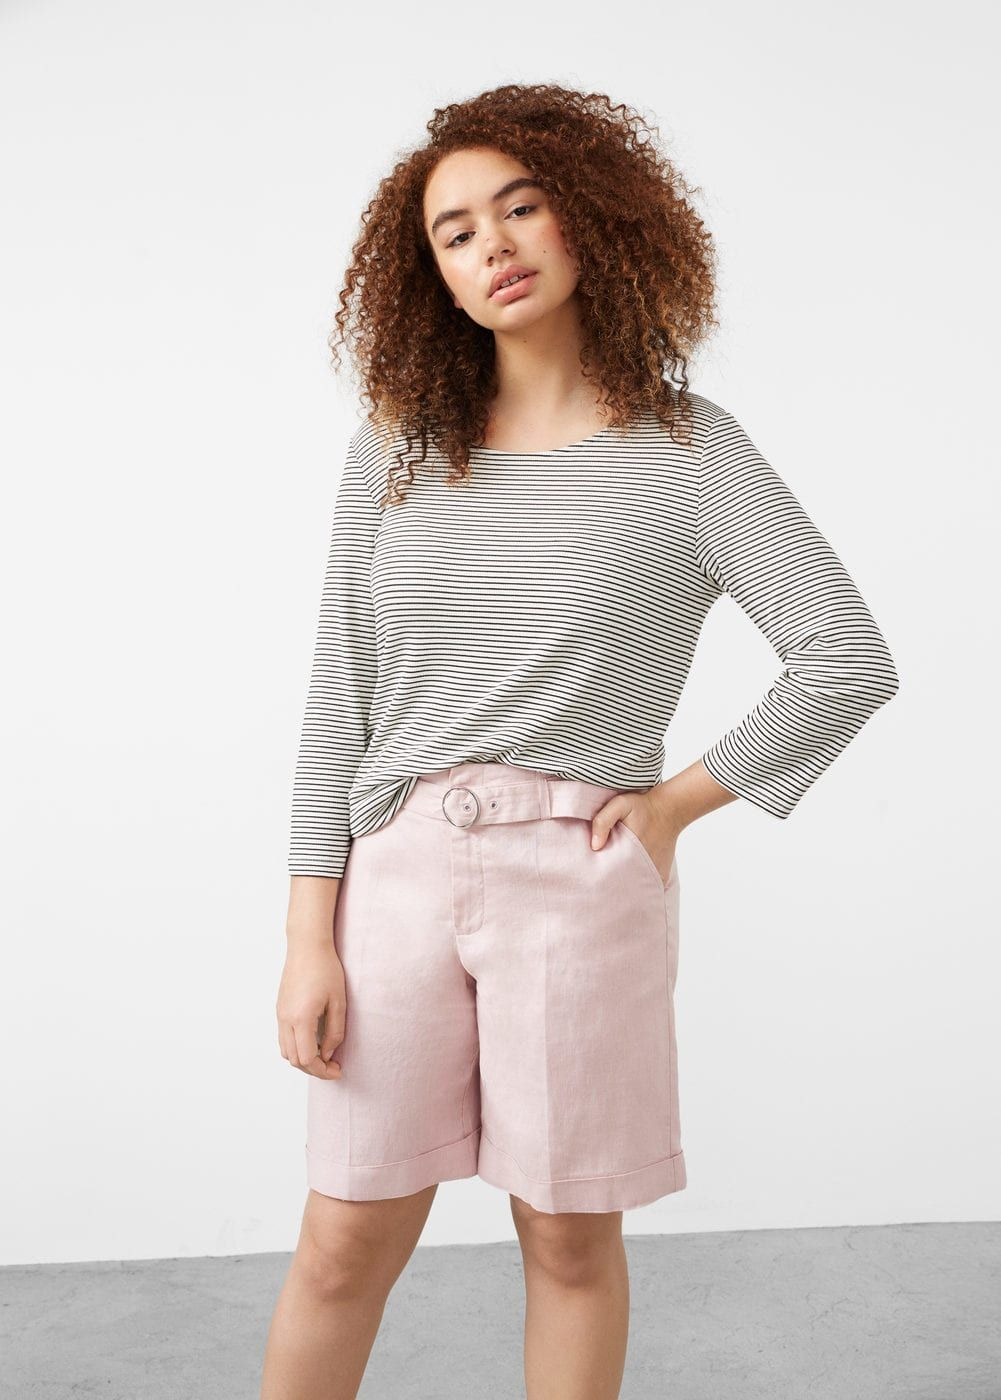 Belt linen-blend bermuda shorts - Shorts  Plus sizes | Violeta by MANGO The Philippines